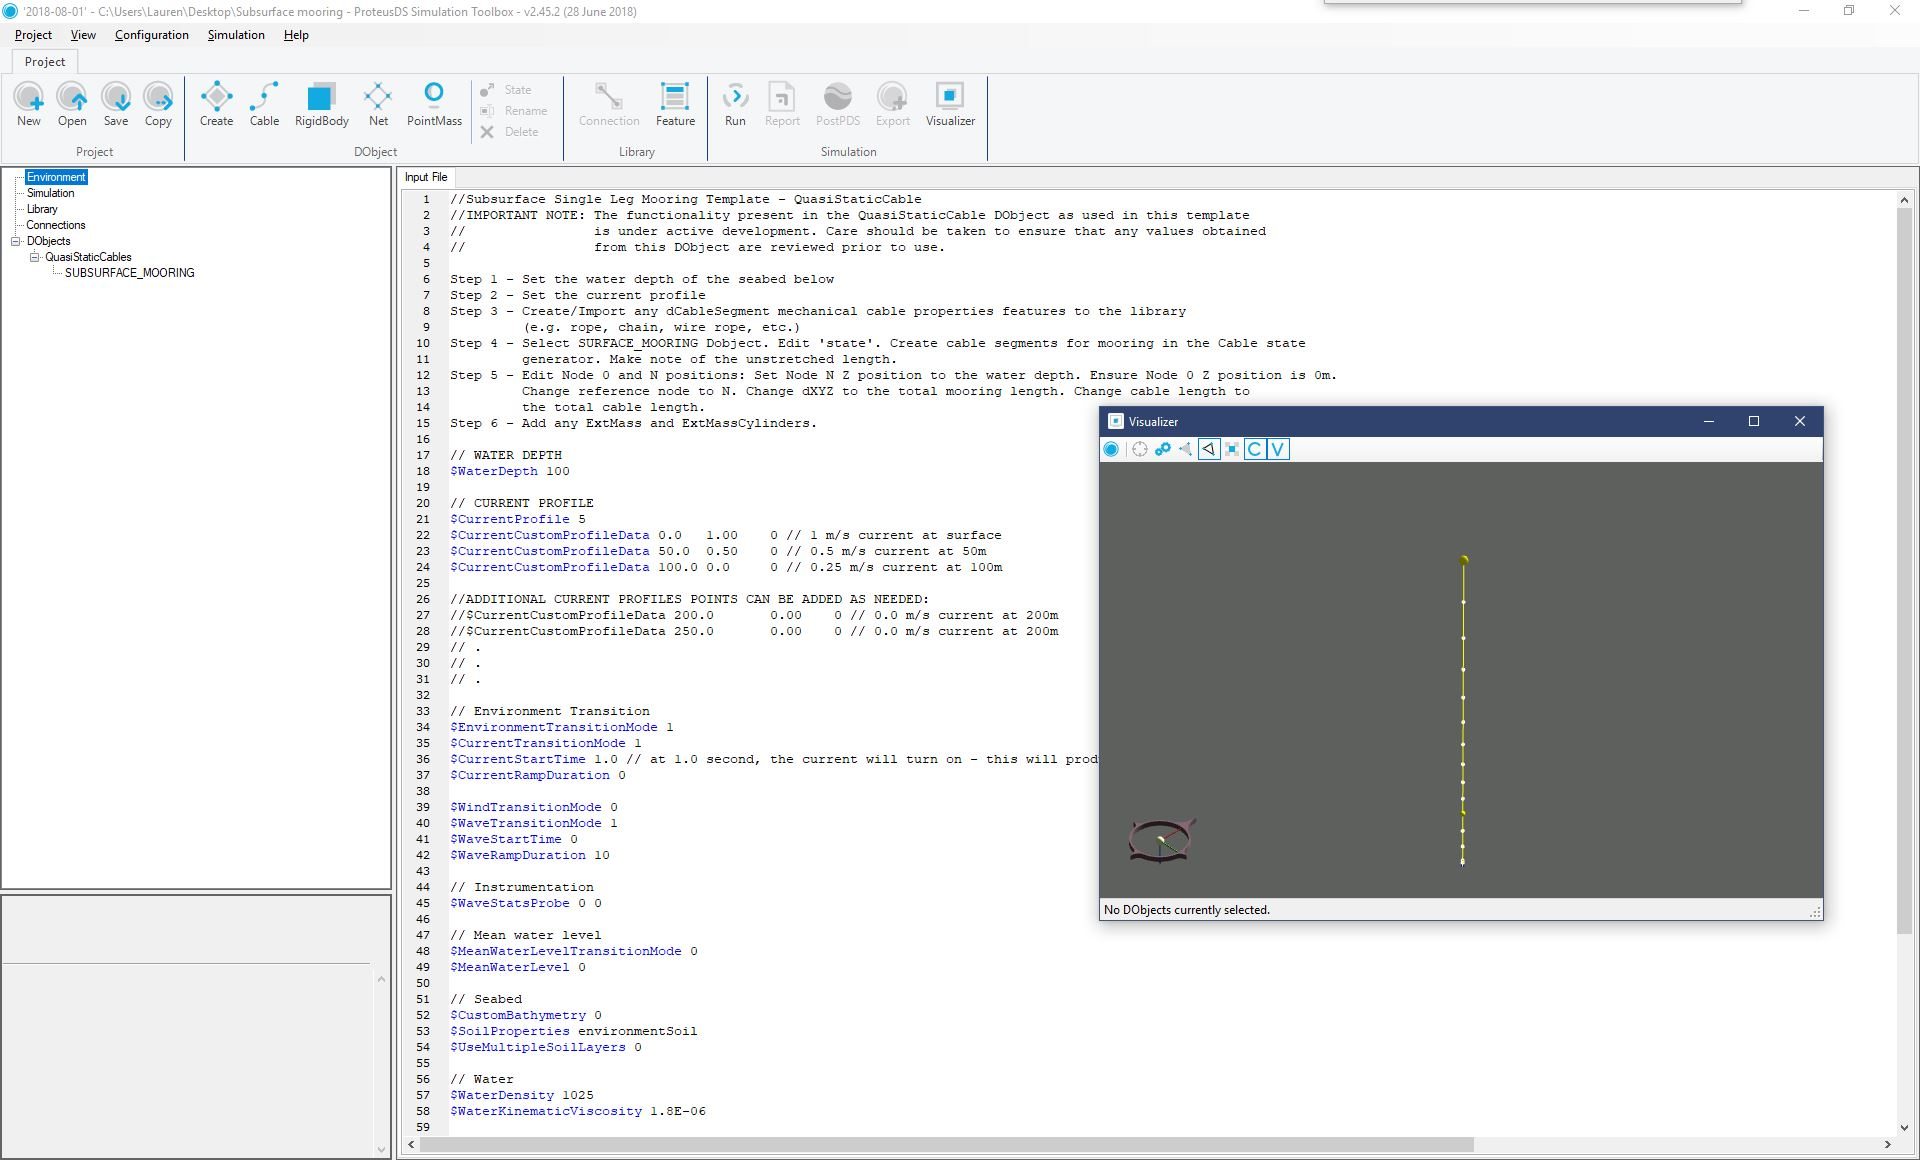 APA_DSA_Subsurface Mooring - ProteusDS ToolboxJPG